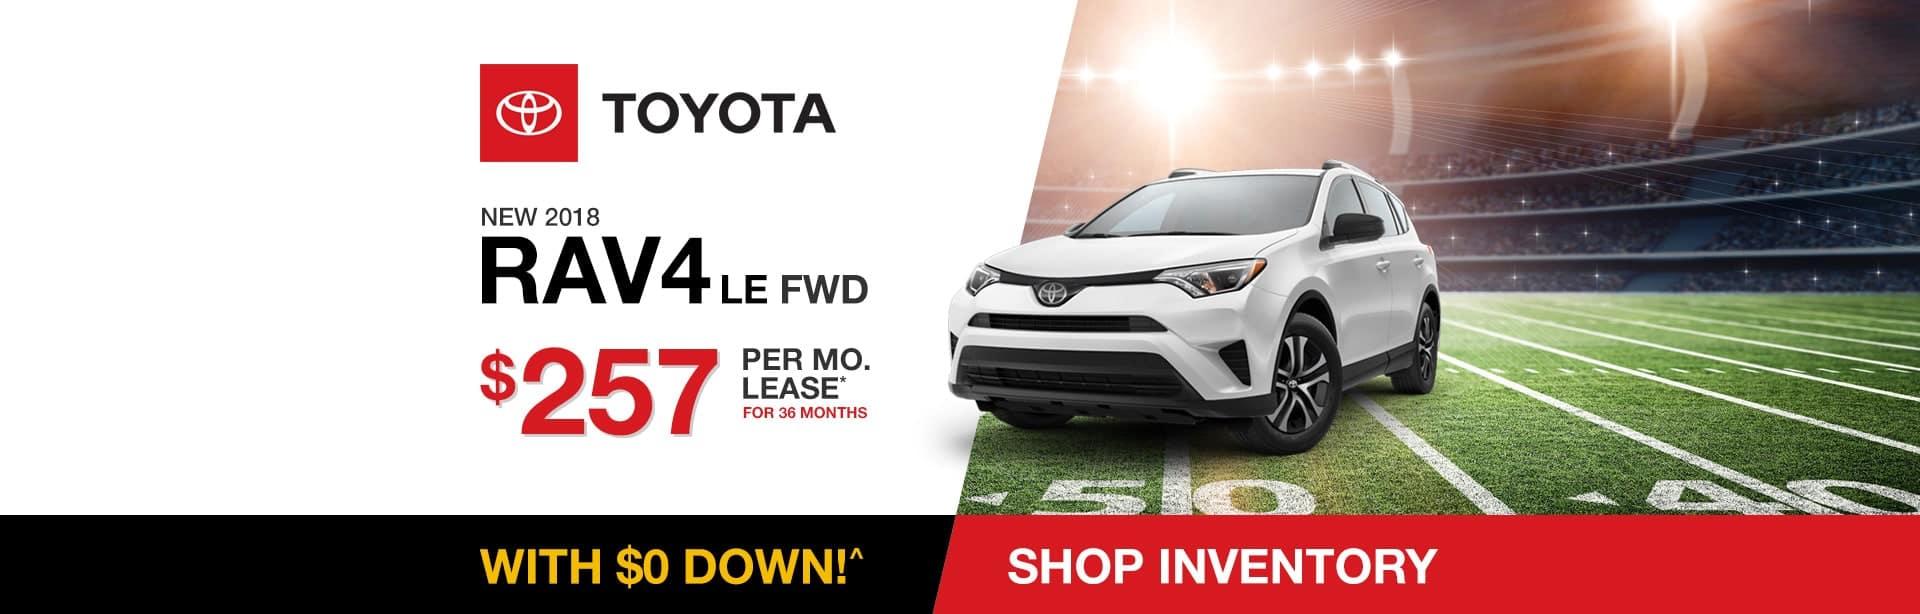 Toyota RAV4 Lease Special near Indianapolis